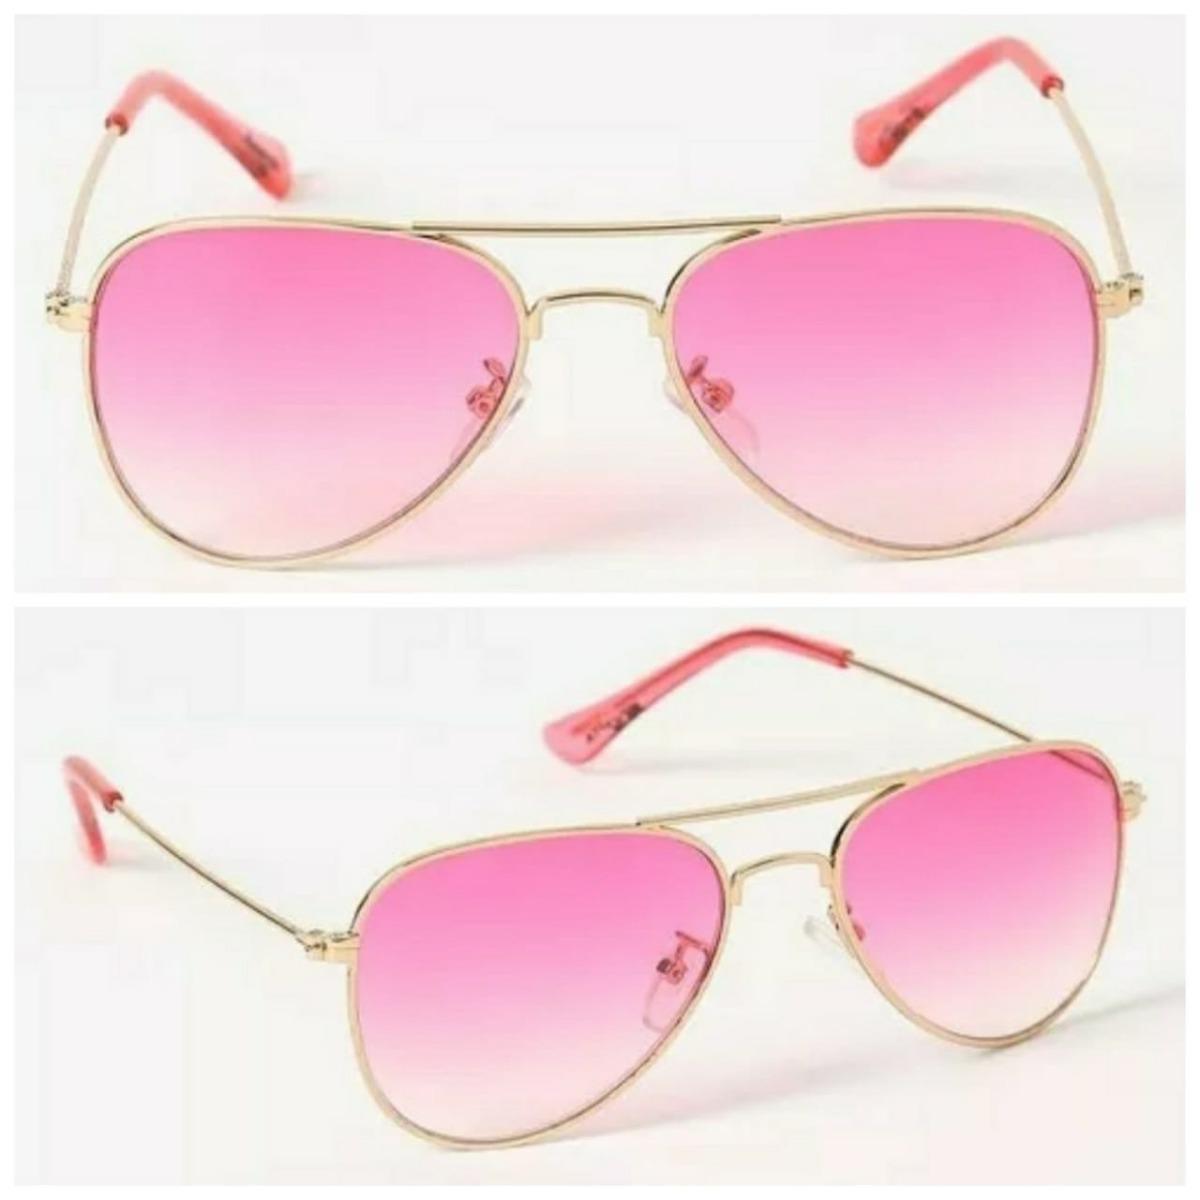 eed12e791 óculos de sol aviador lente rosa menina infantil moda barato. Carregando  zoom.